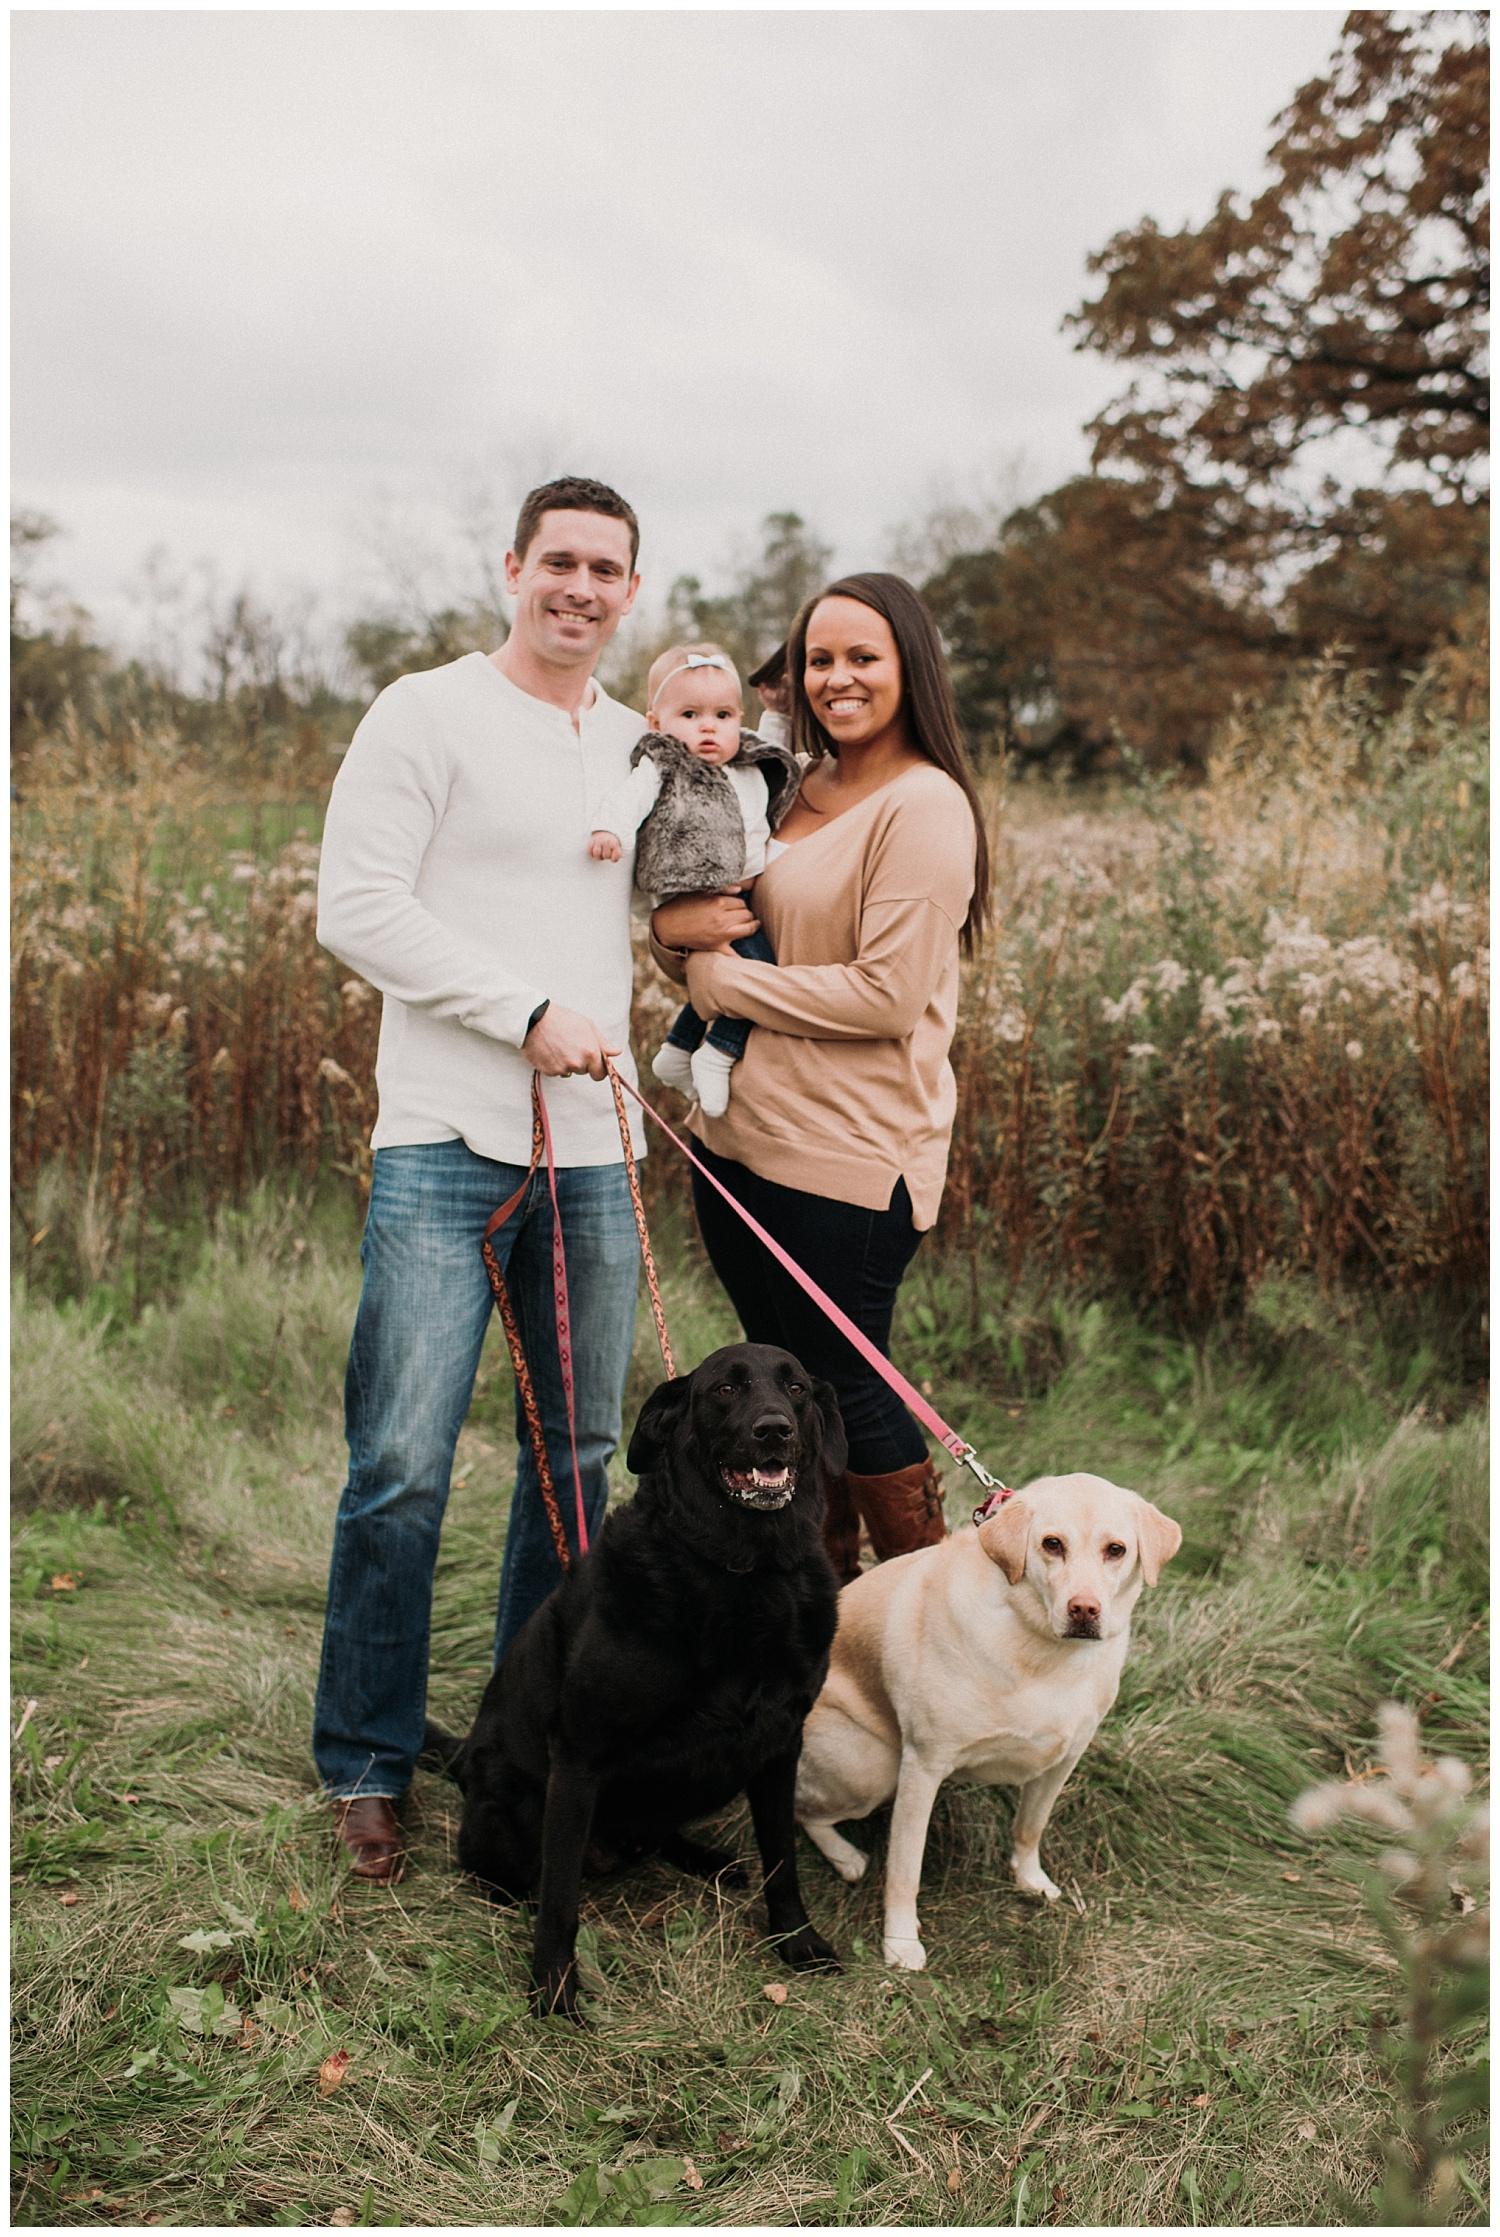 Brookfield-Family-Photographer-2019 (1).jpg